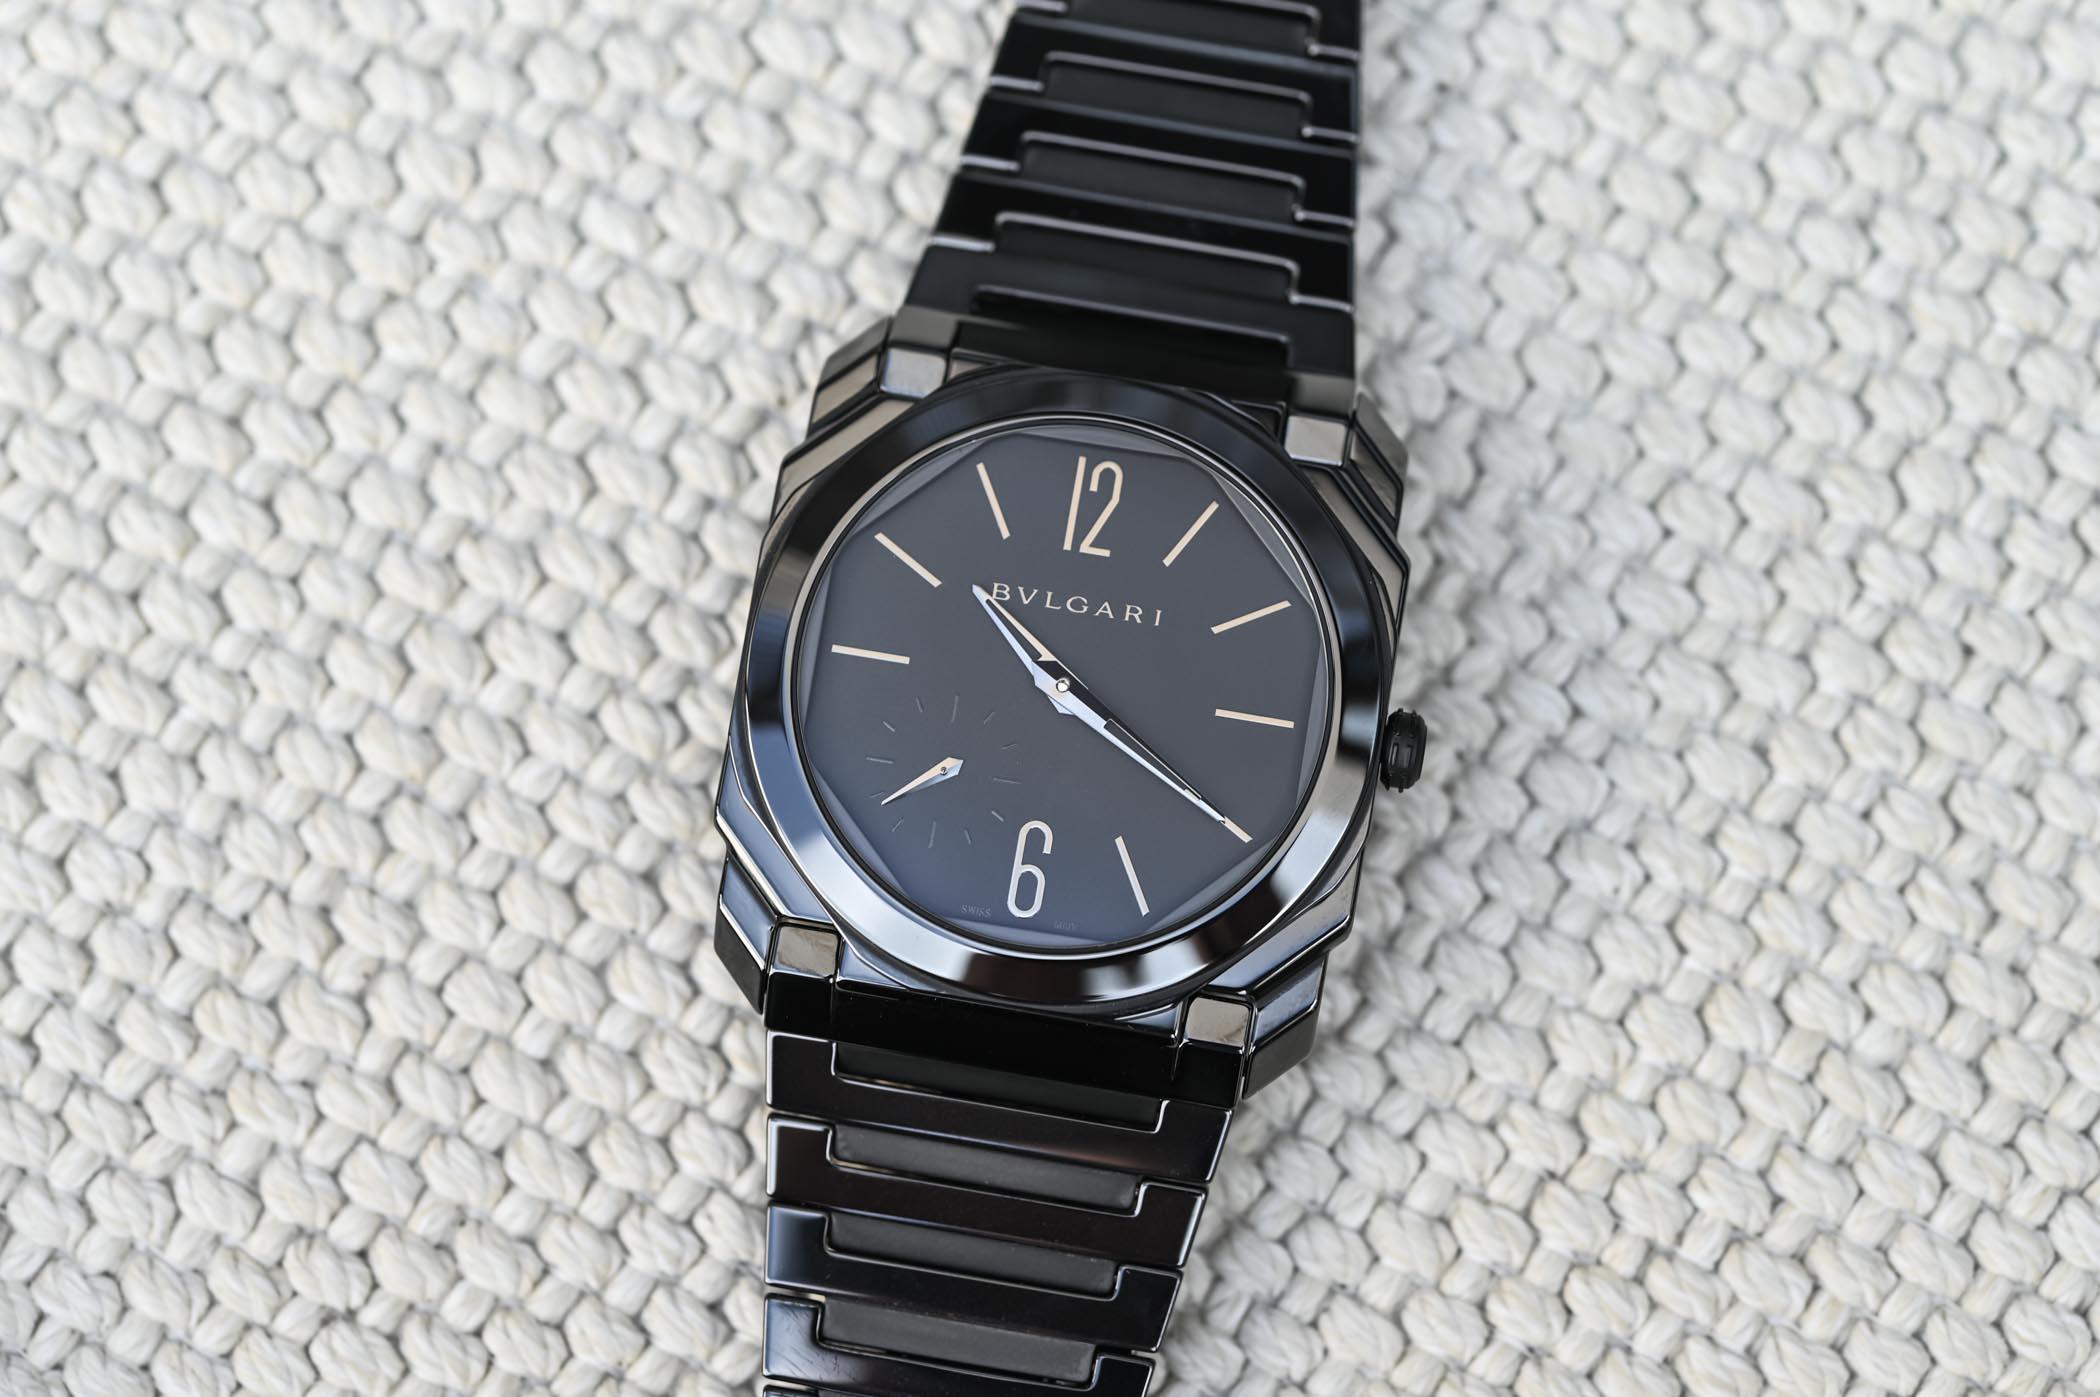 Bvlgari Octo Finissimo Automatic Black Sandblast-Polished Ceramic